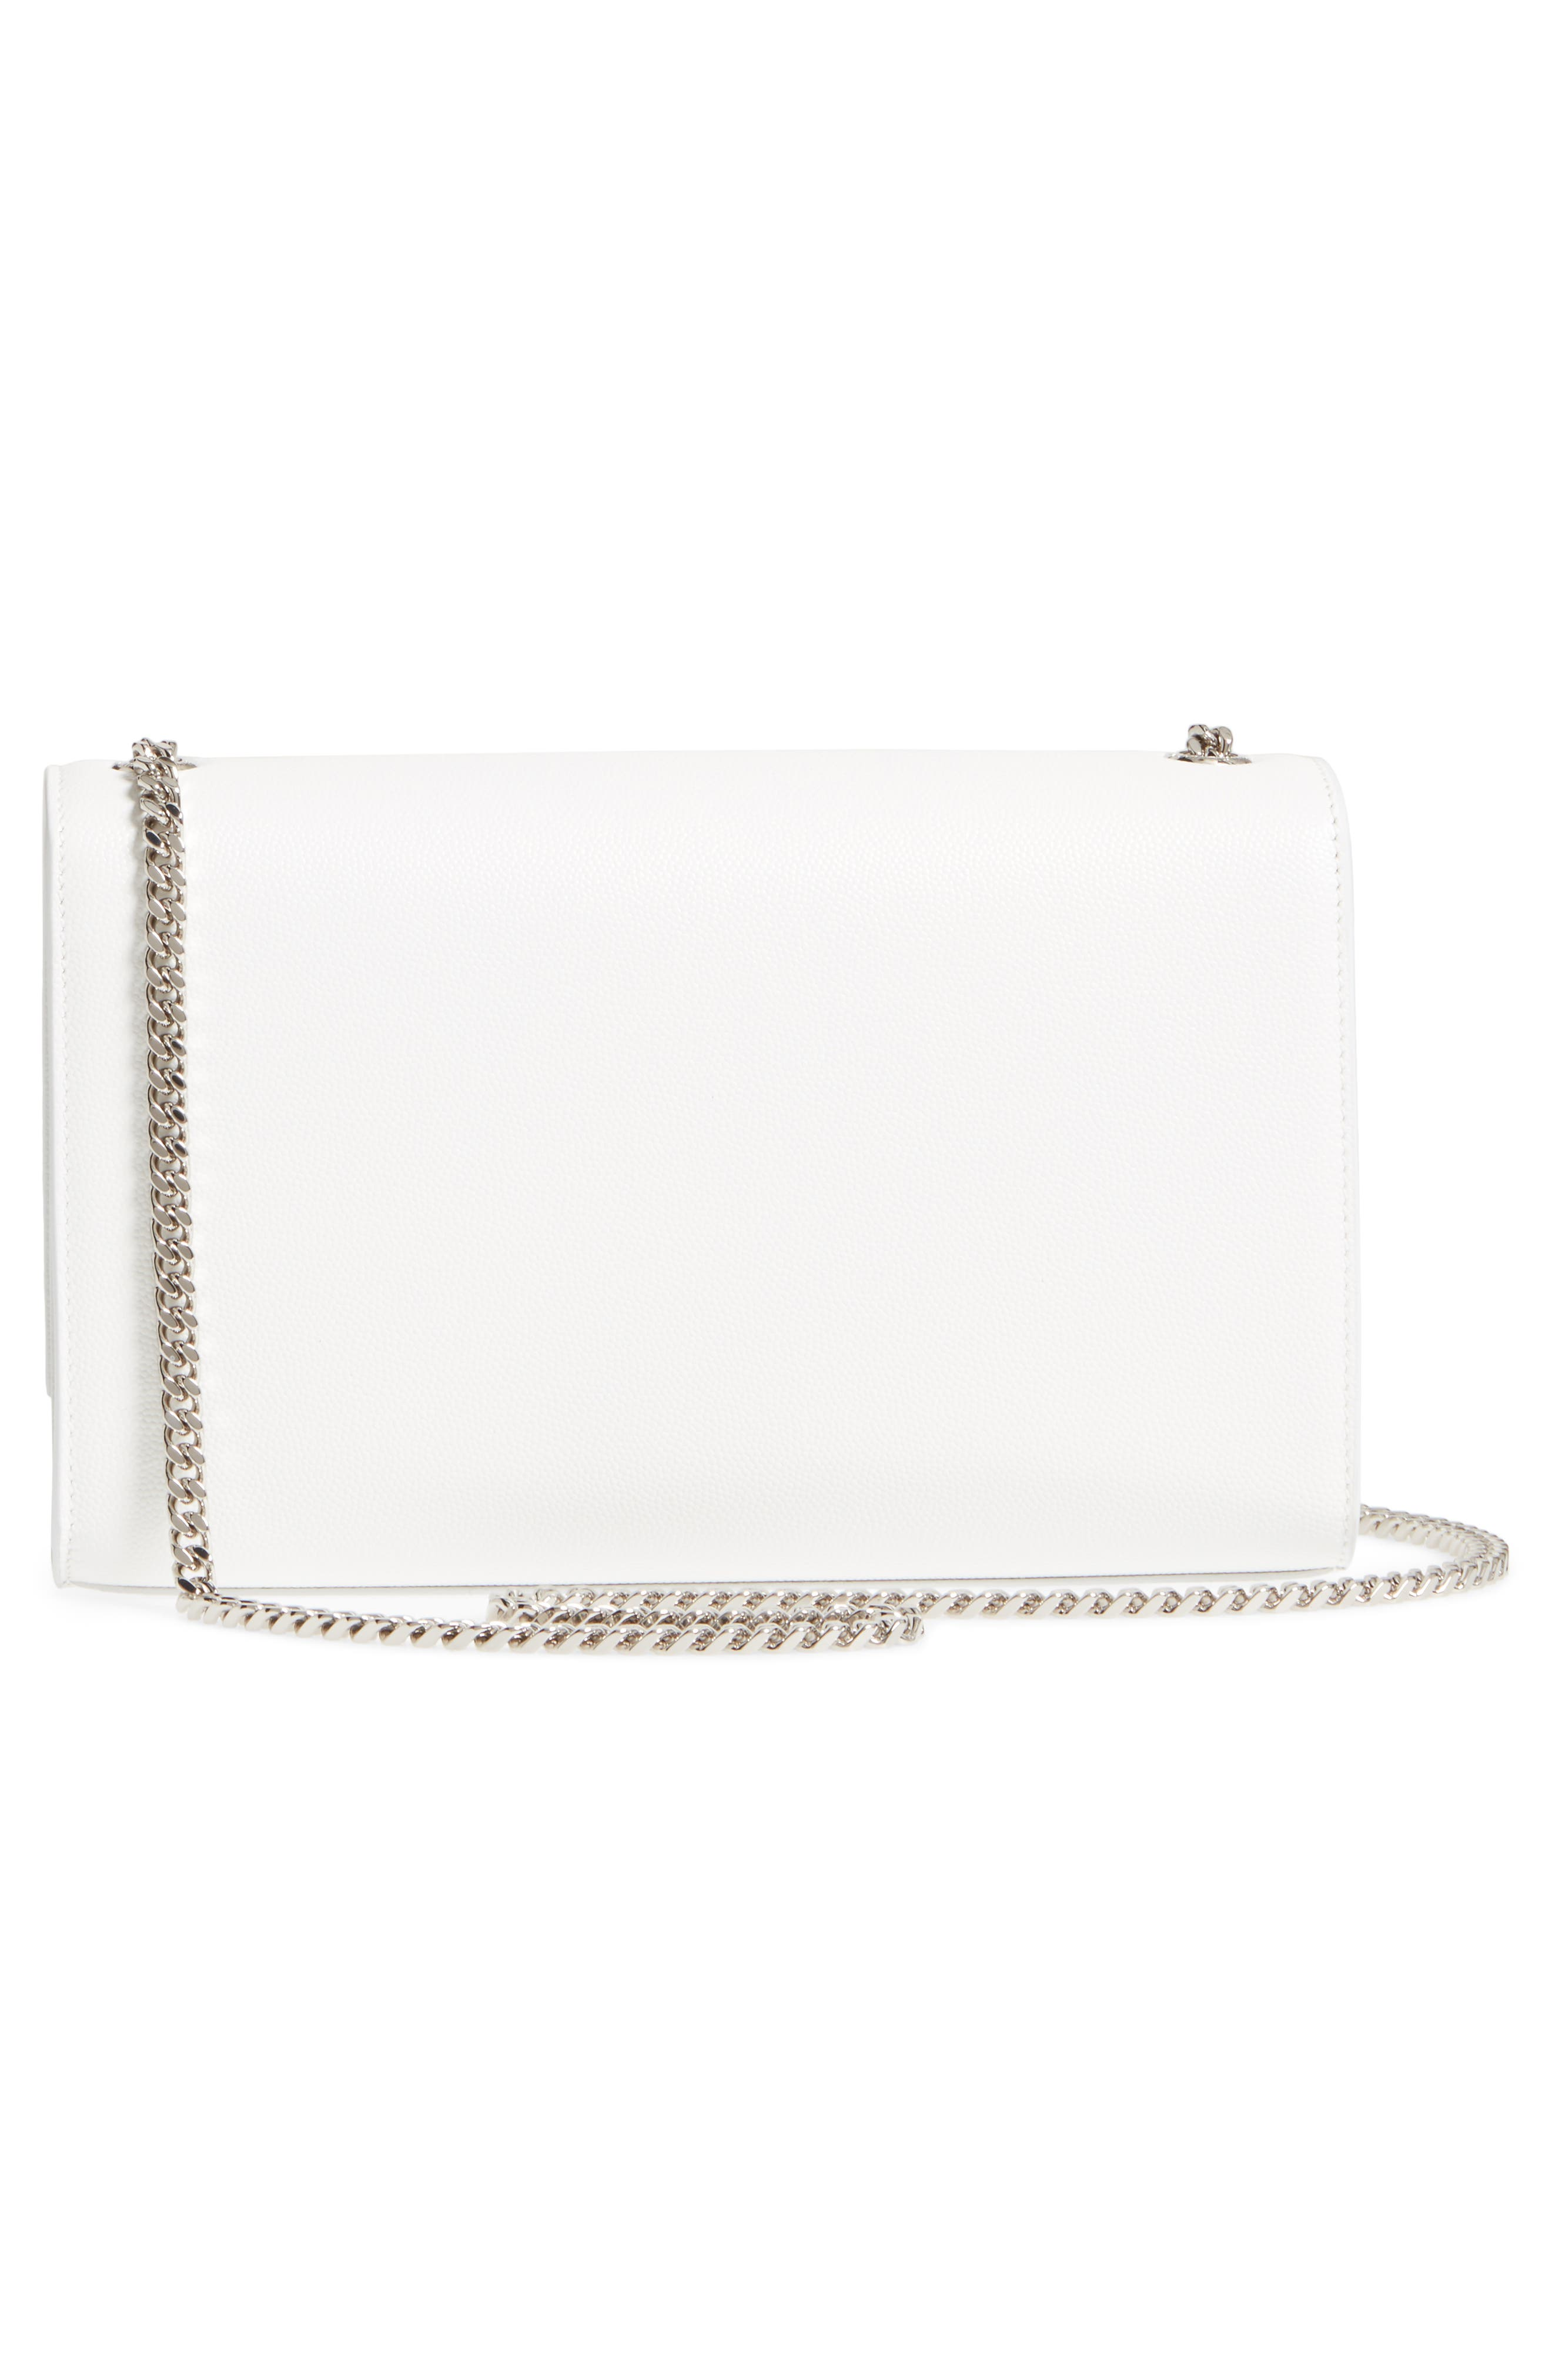 Alternate Image 3  - Saint Laurent Medium Kate Calfskin Leather Wallet on a Chain